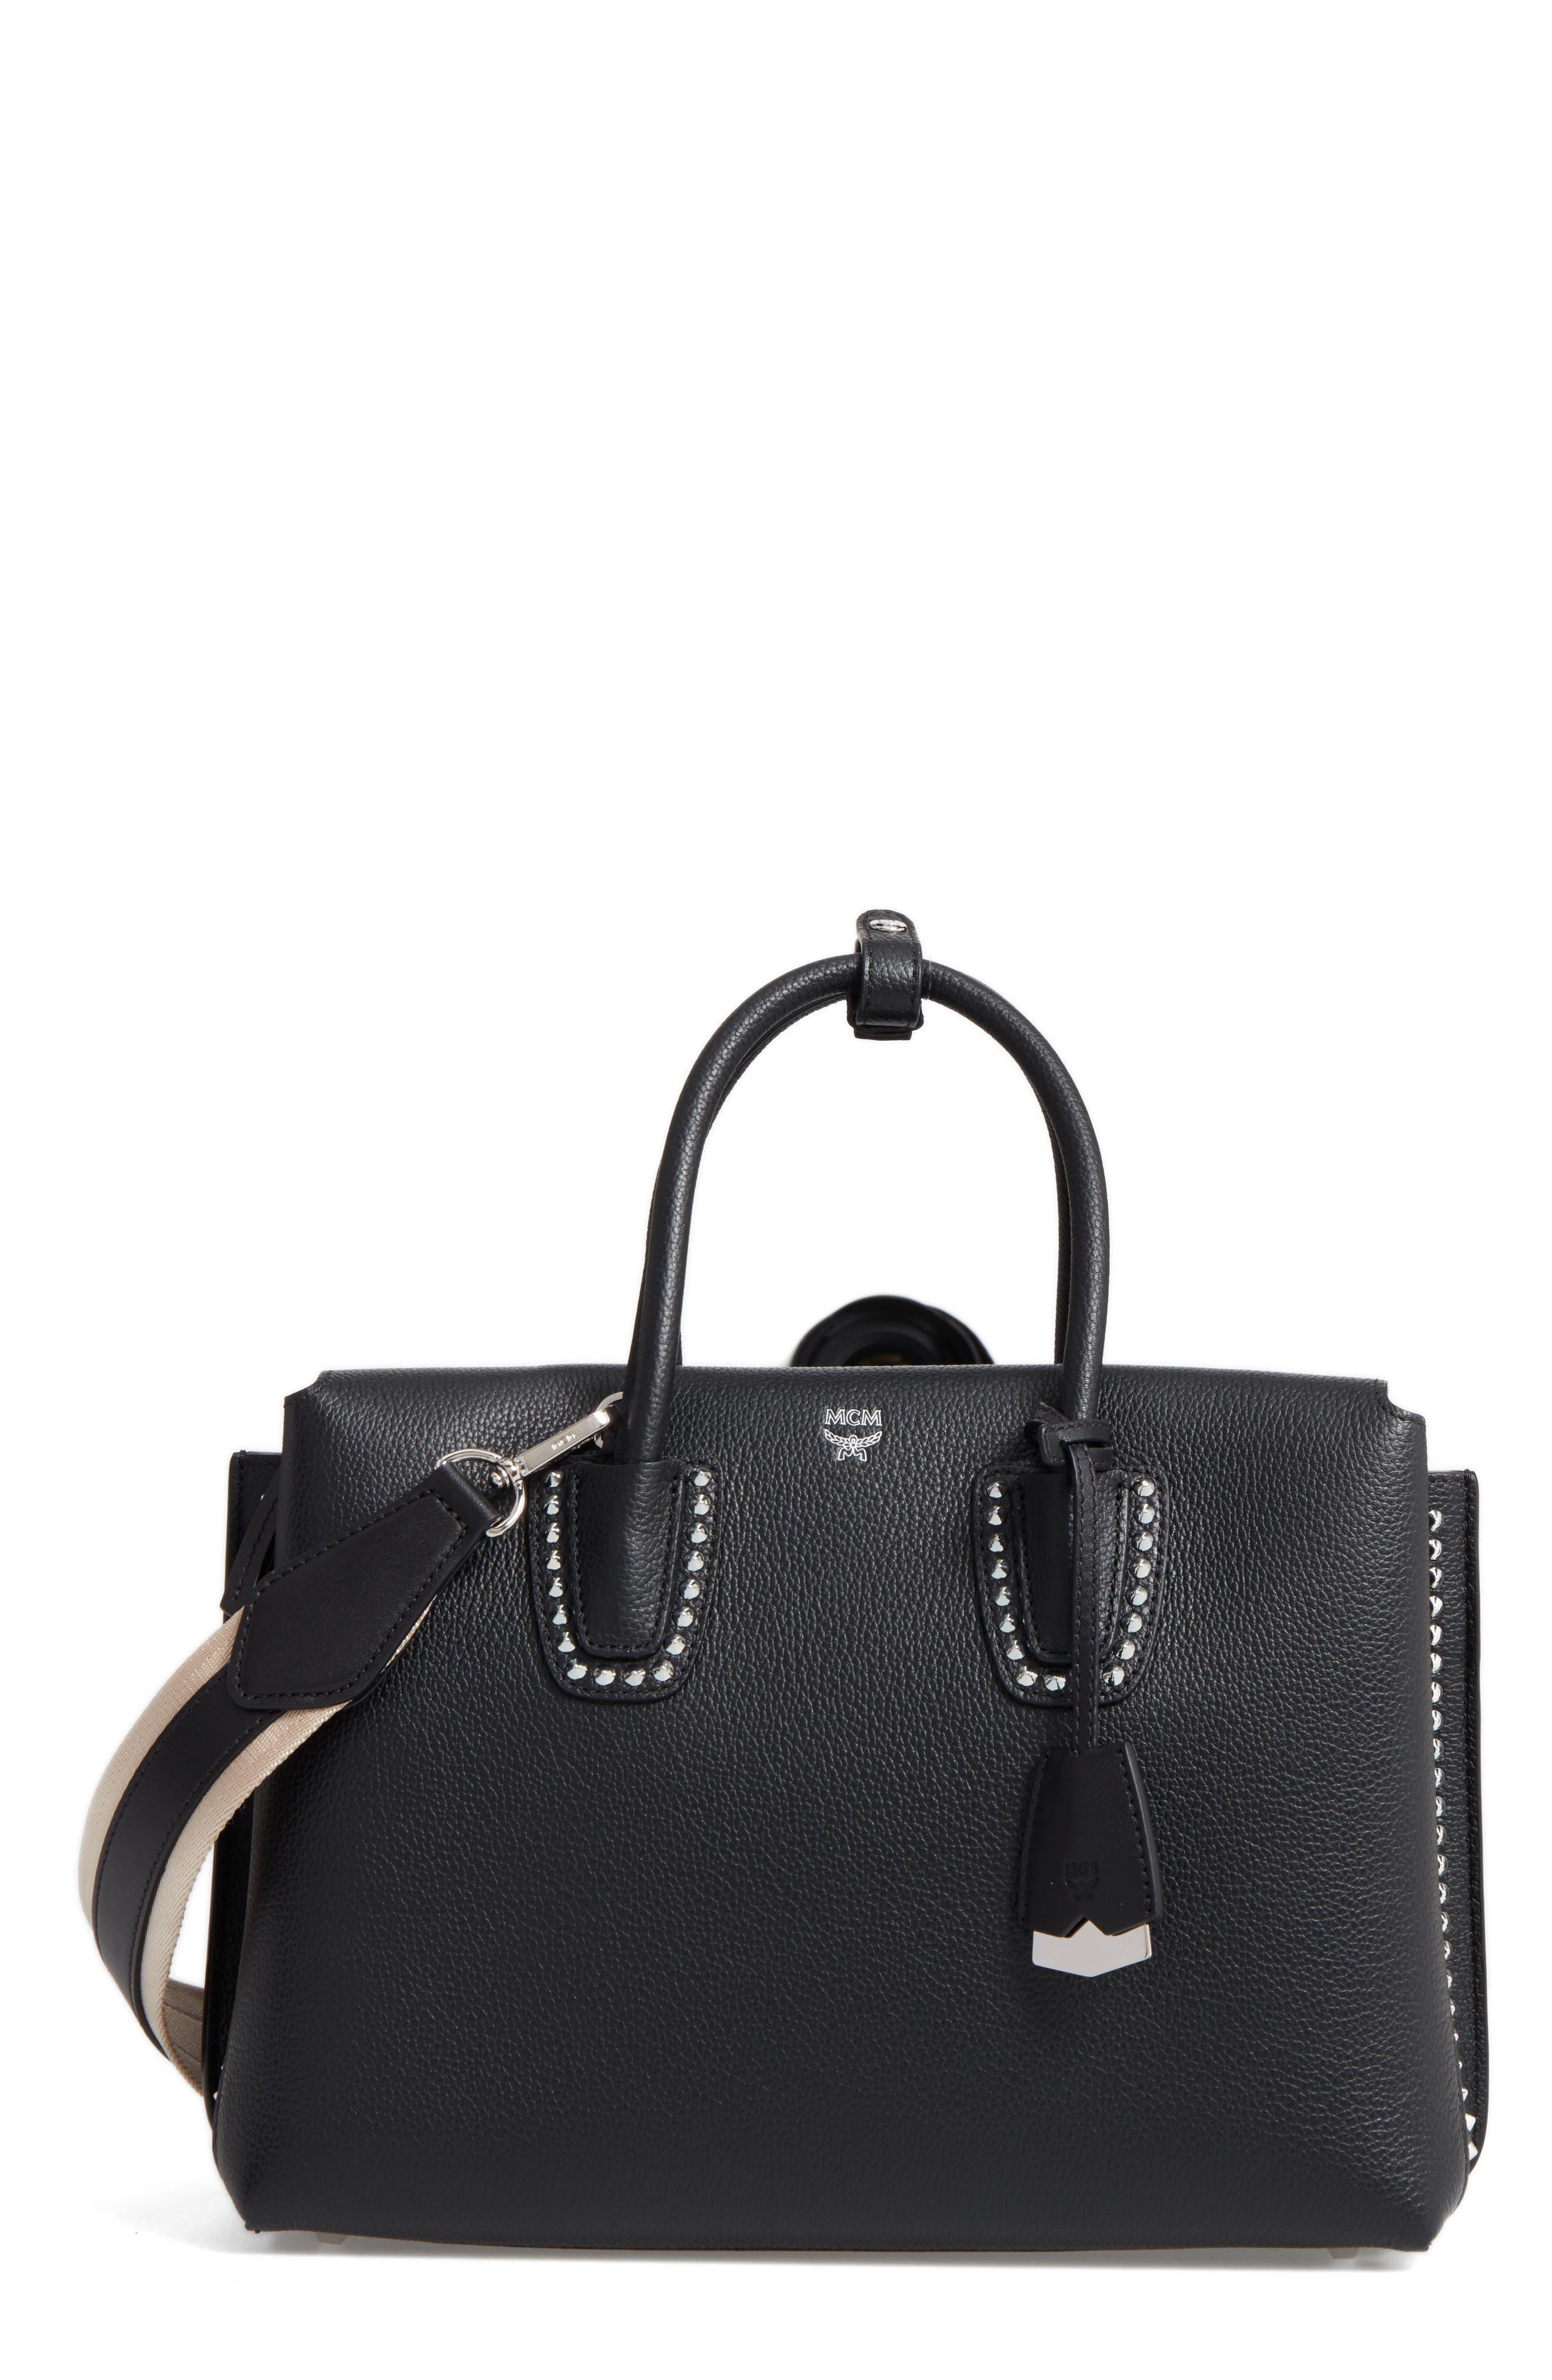 Medium Milla Studded Leather Tote,                             Main thumbnail 1, color,                             Black